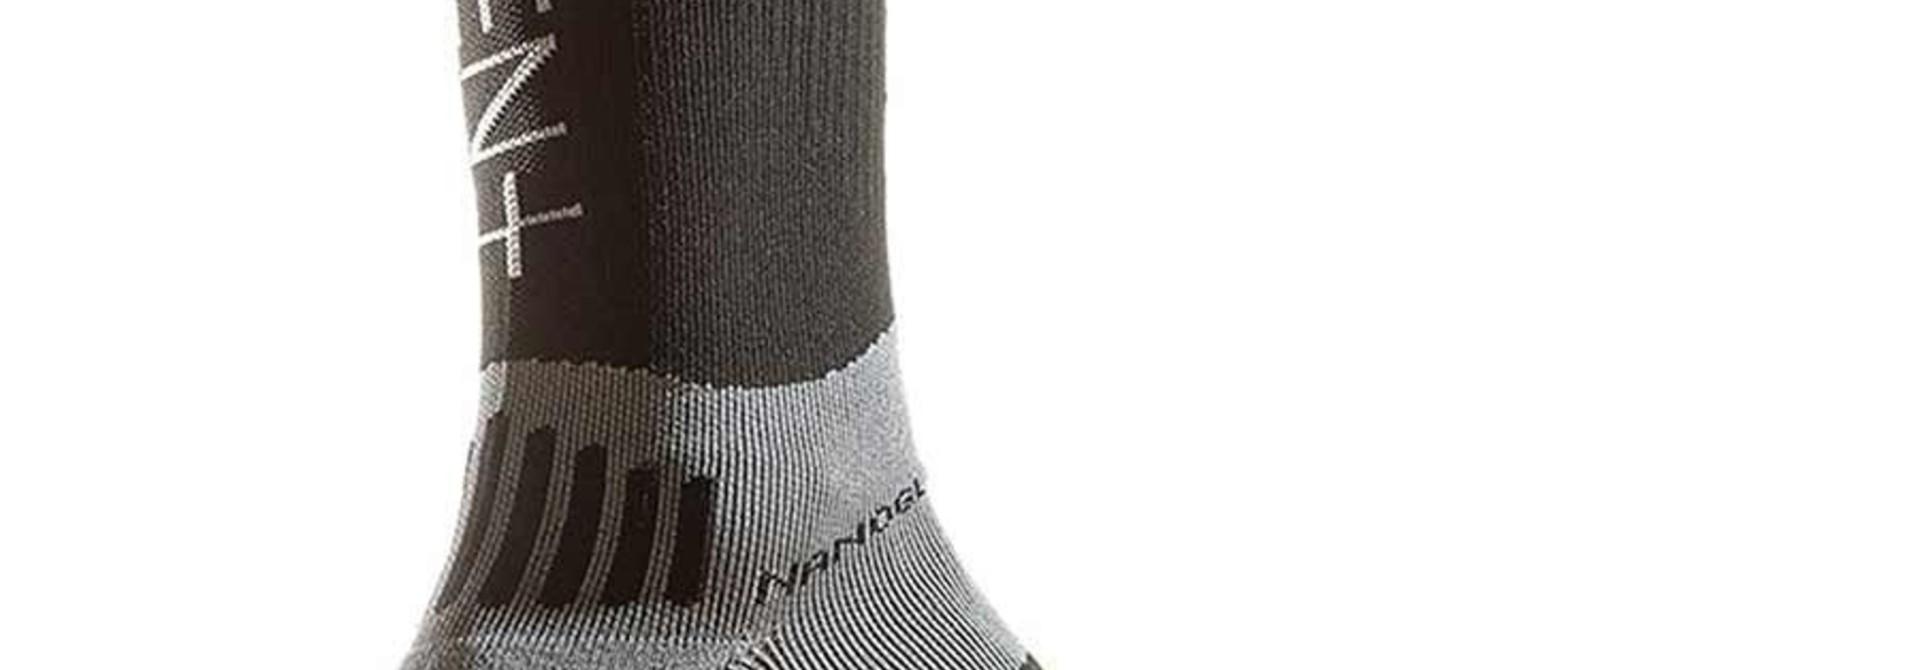 "Dissent, Supercrew Nano 8"", Compression Socks BLACK"